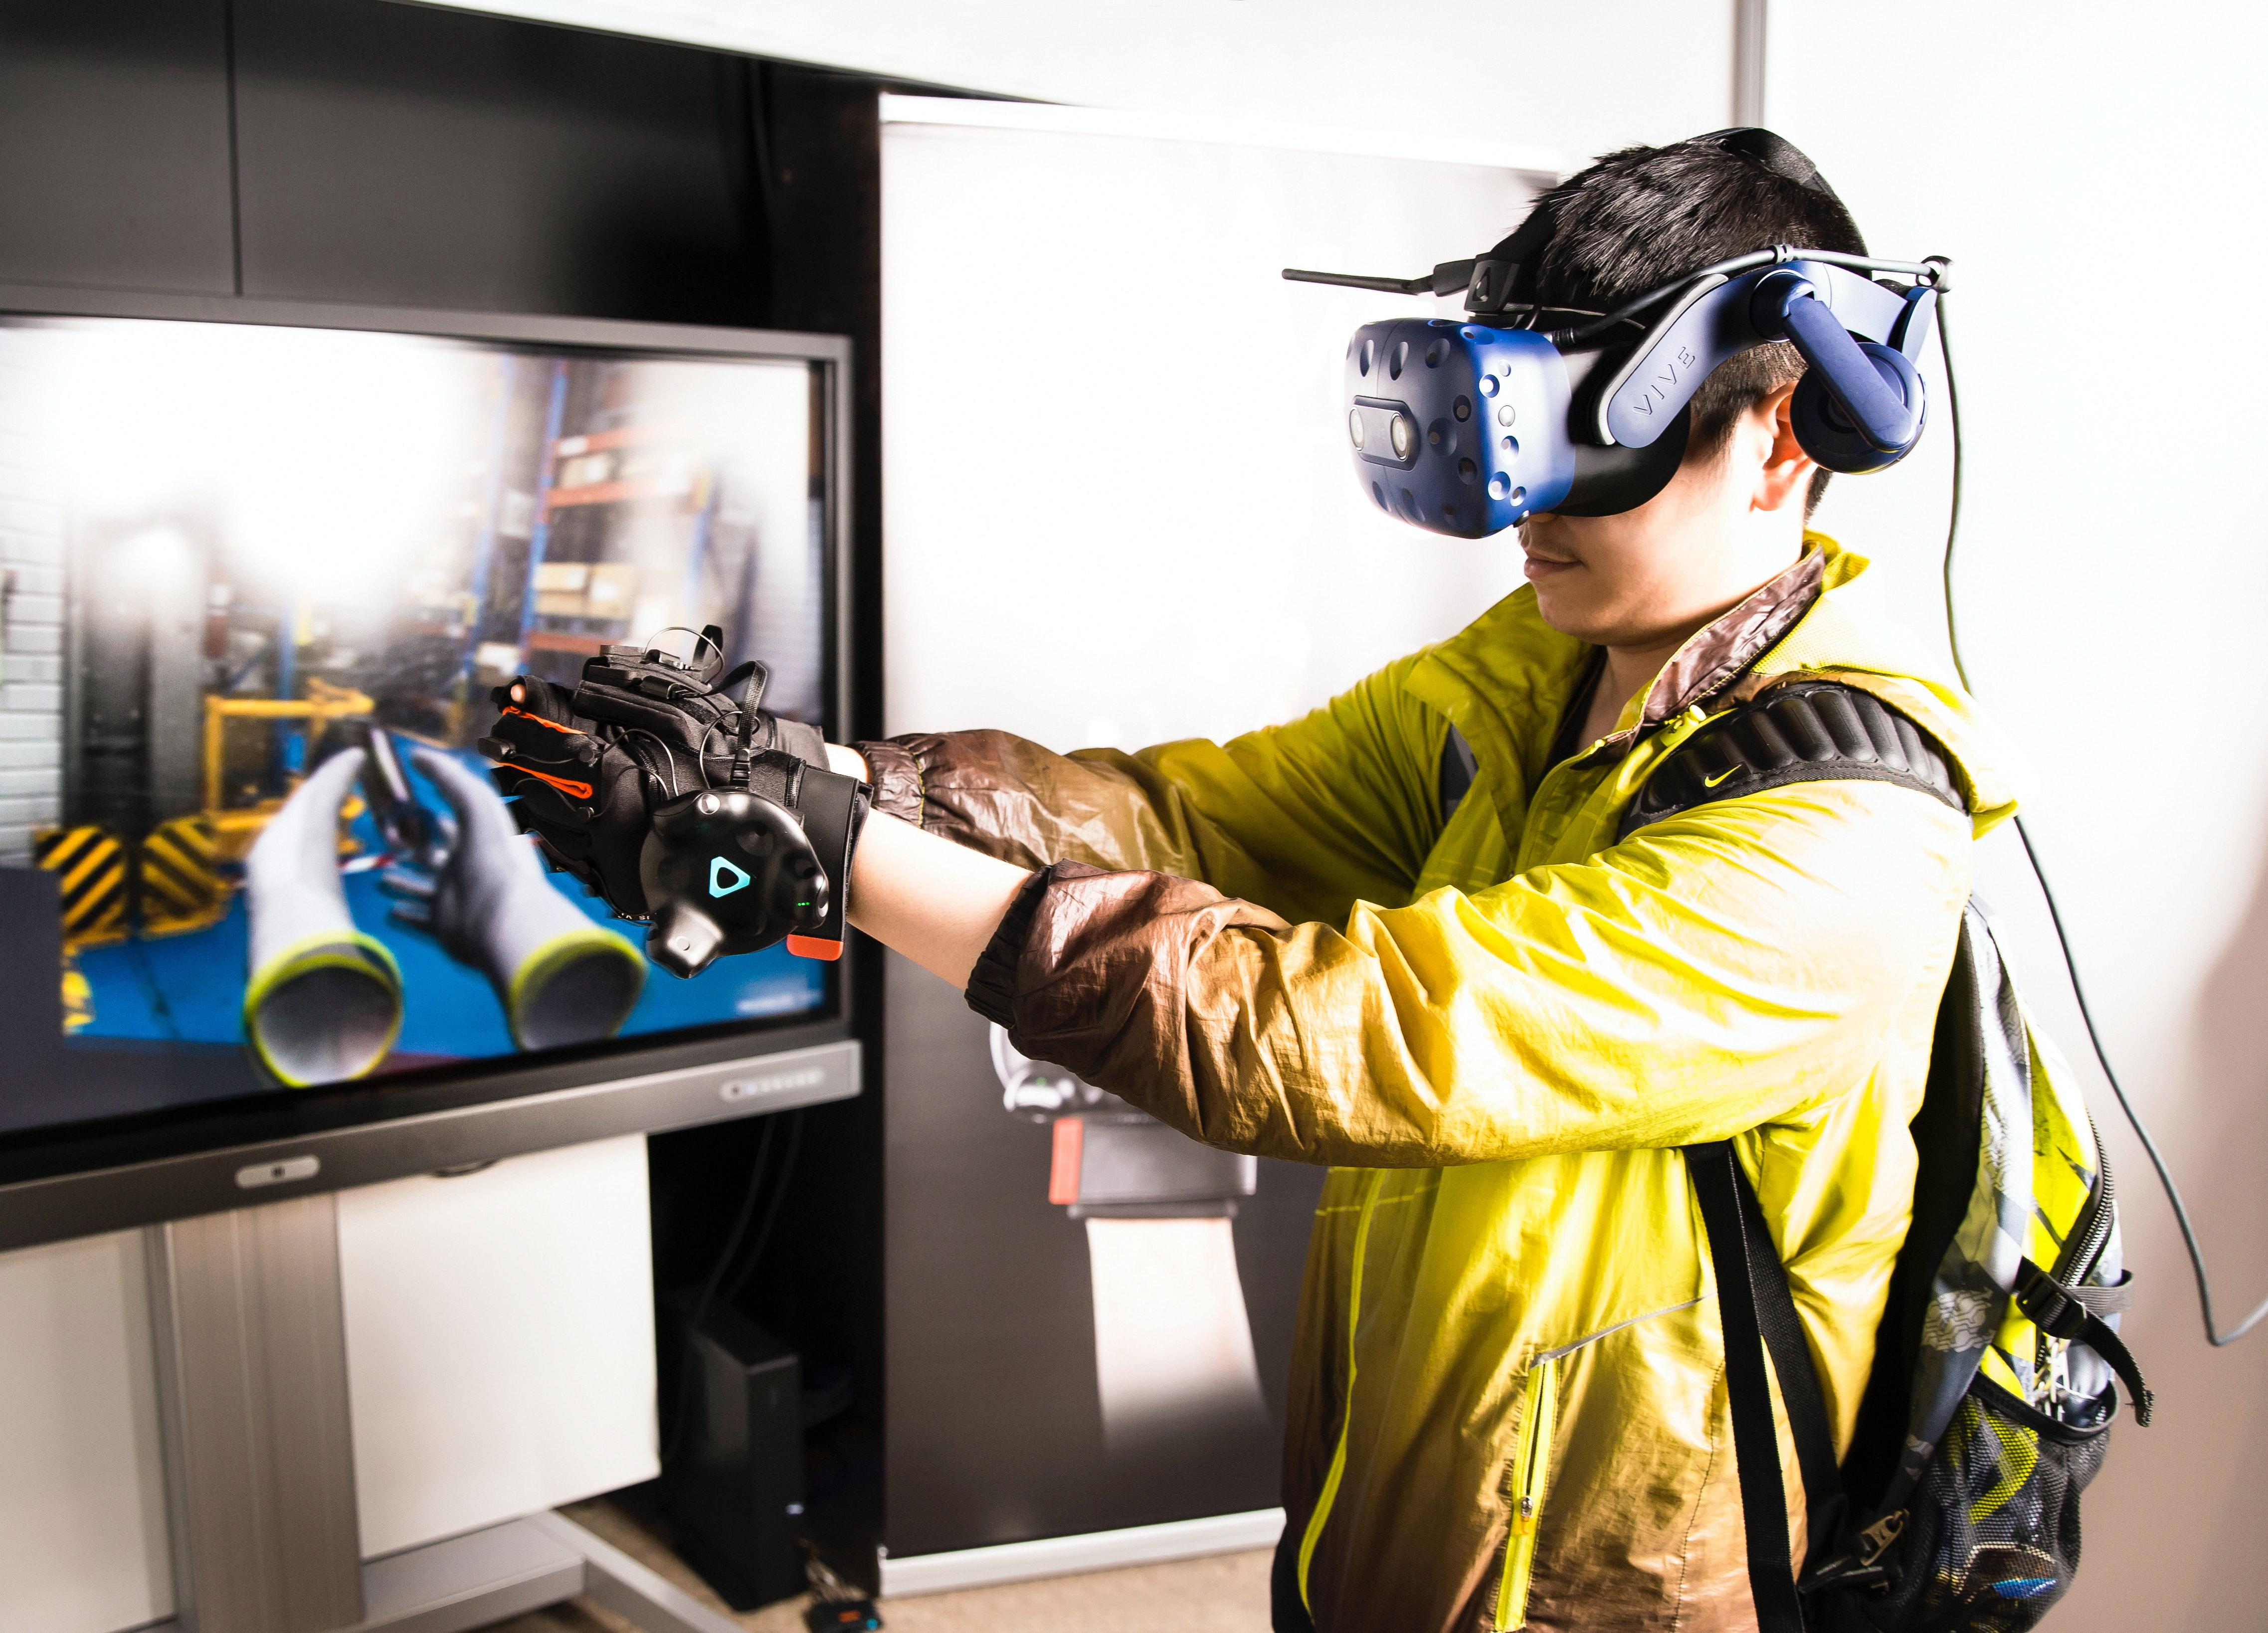 Using virtual reality for training company staff